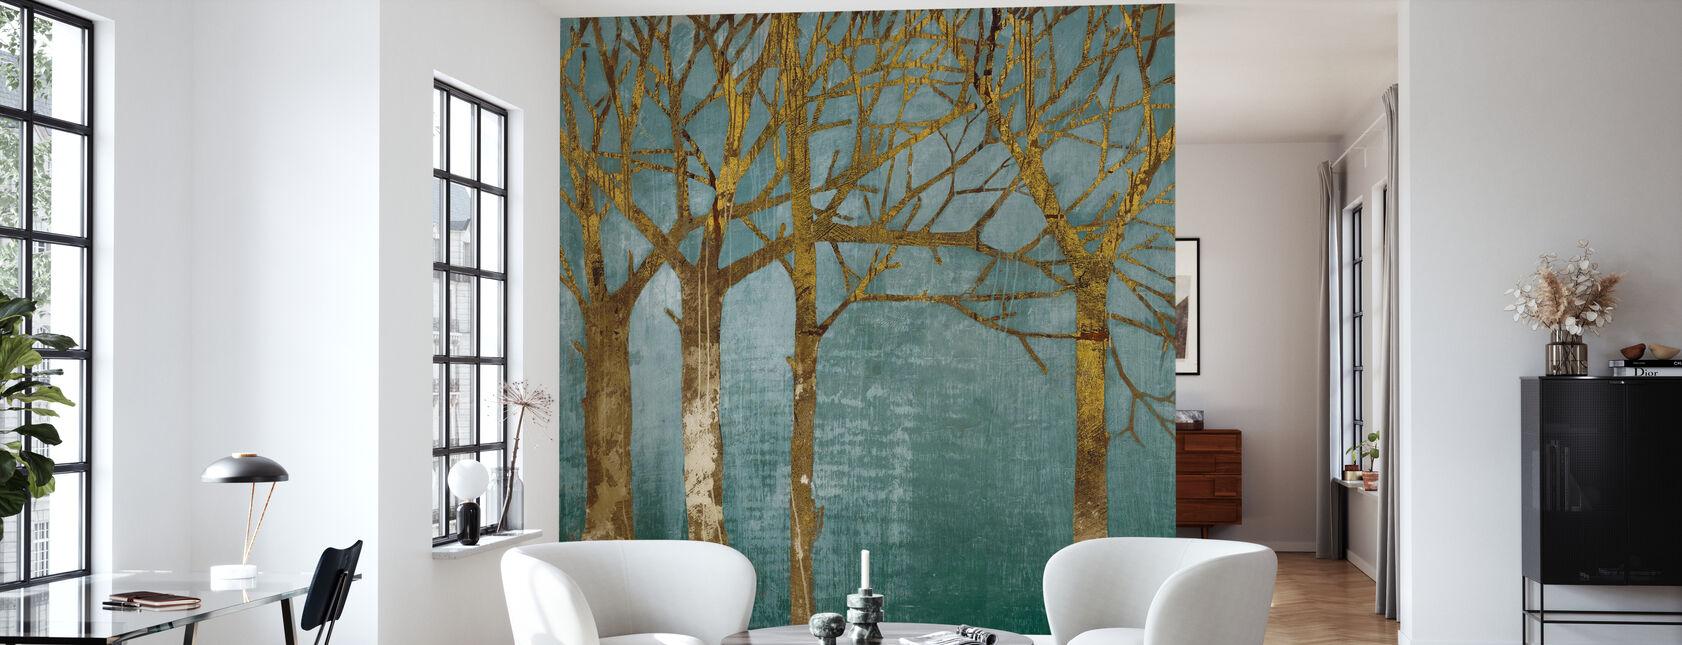 Golden Day Turquoise - Wallpaper - Living Room